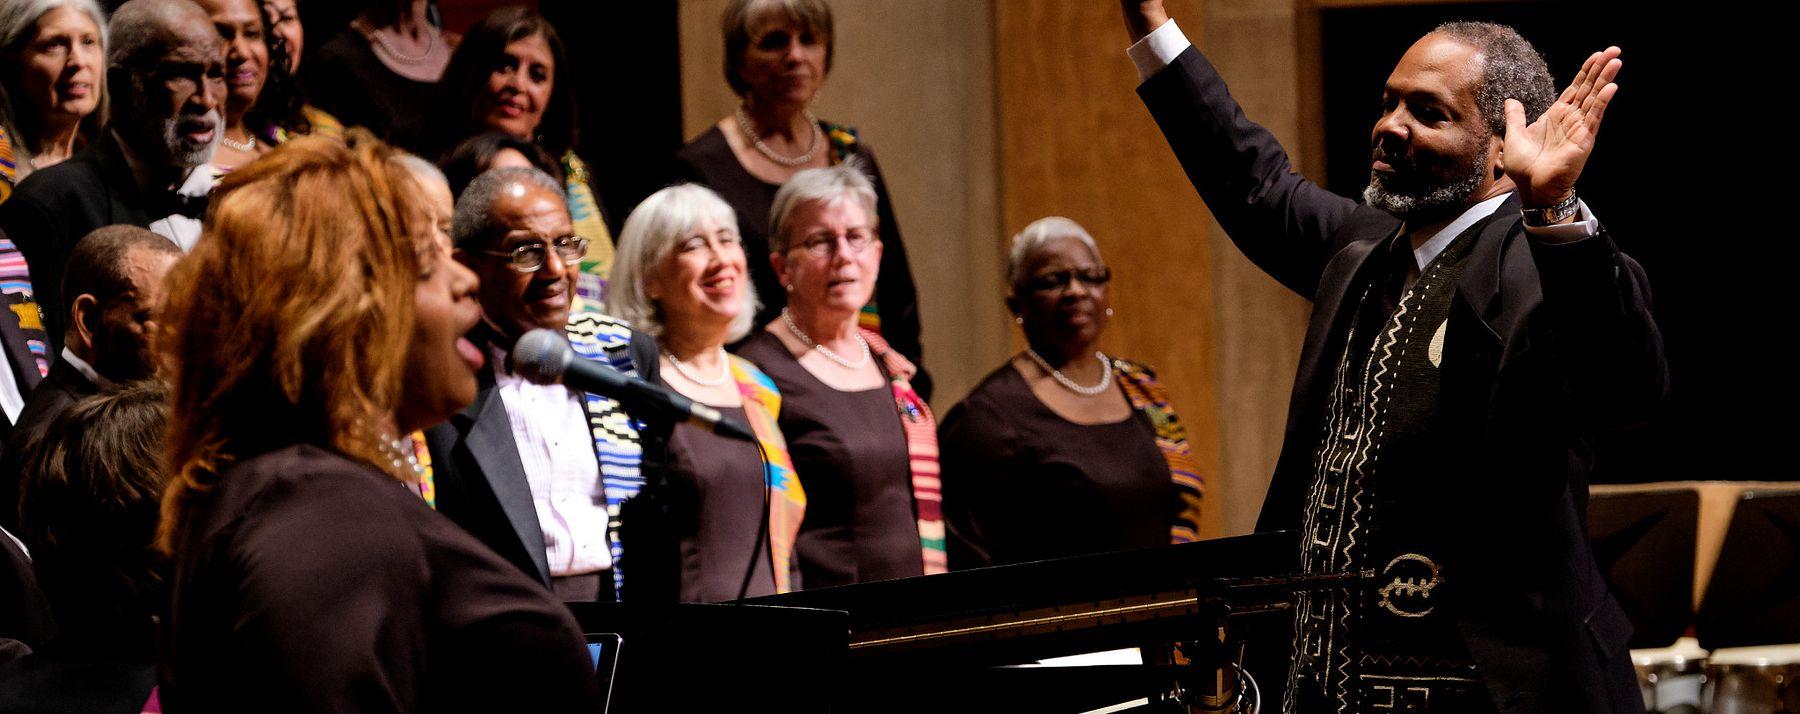 Spirituals Project Choir performs.